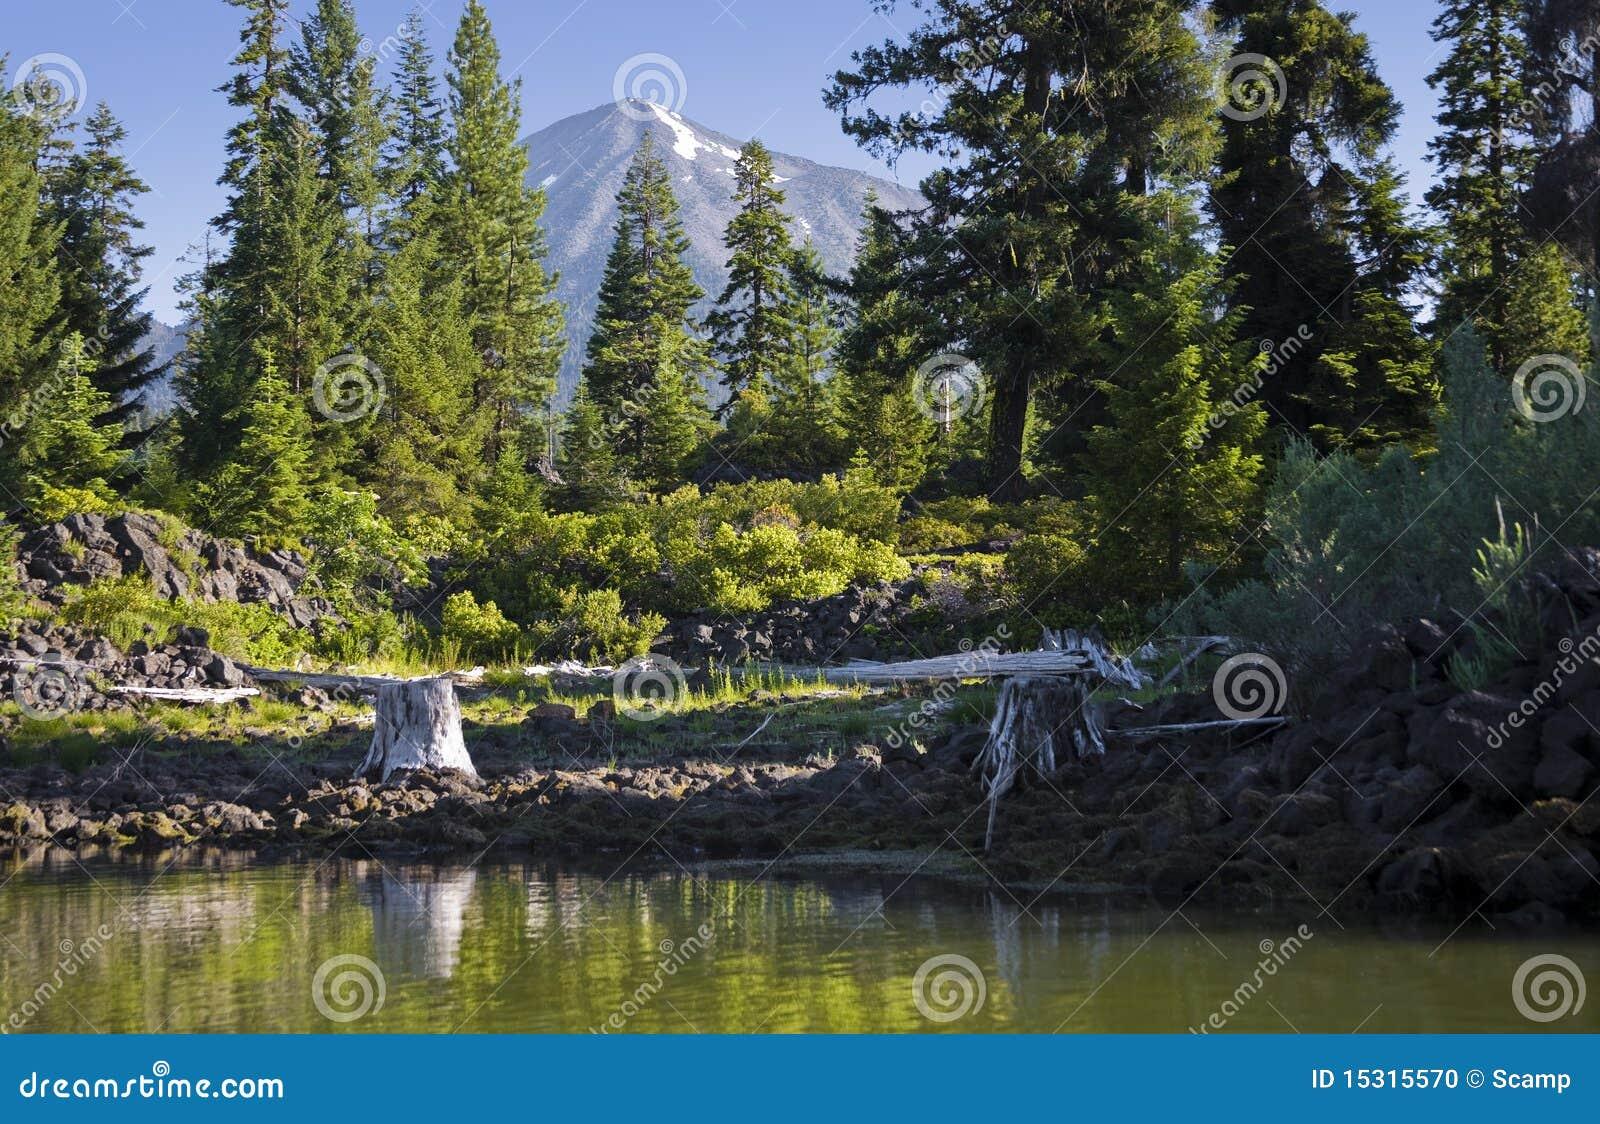 Fish lake oregon stock photo image 15315570 for Clear lake oregon fishing